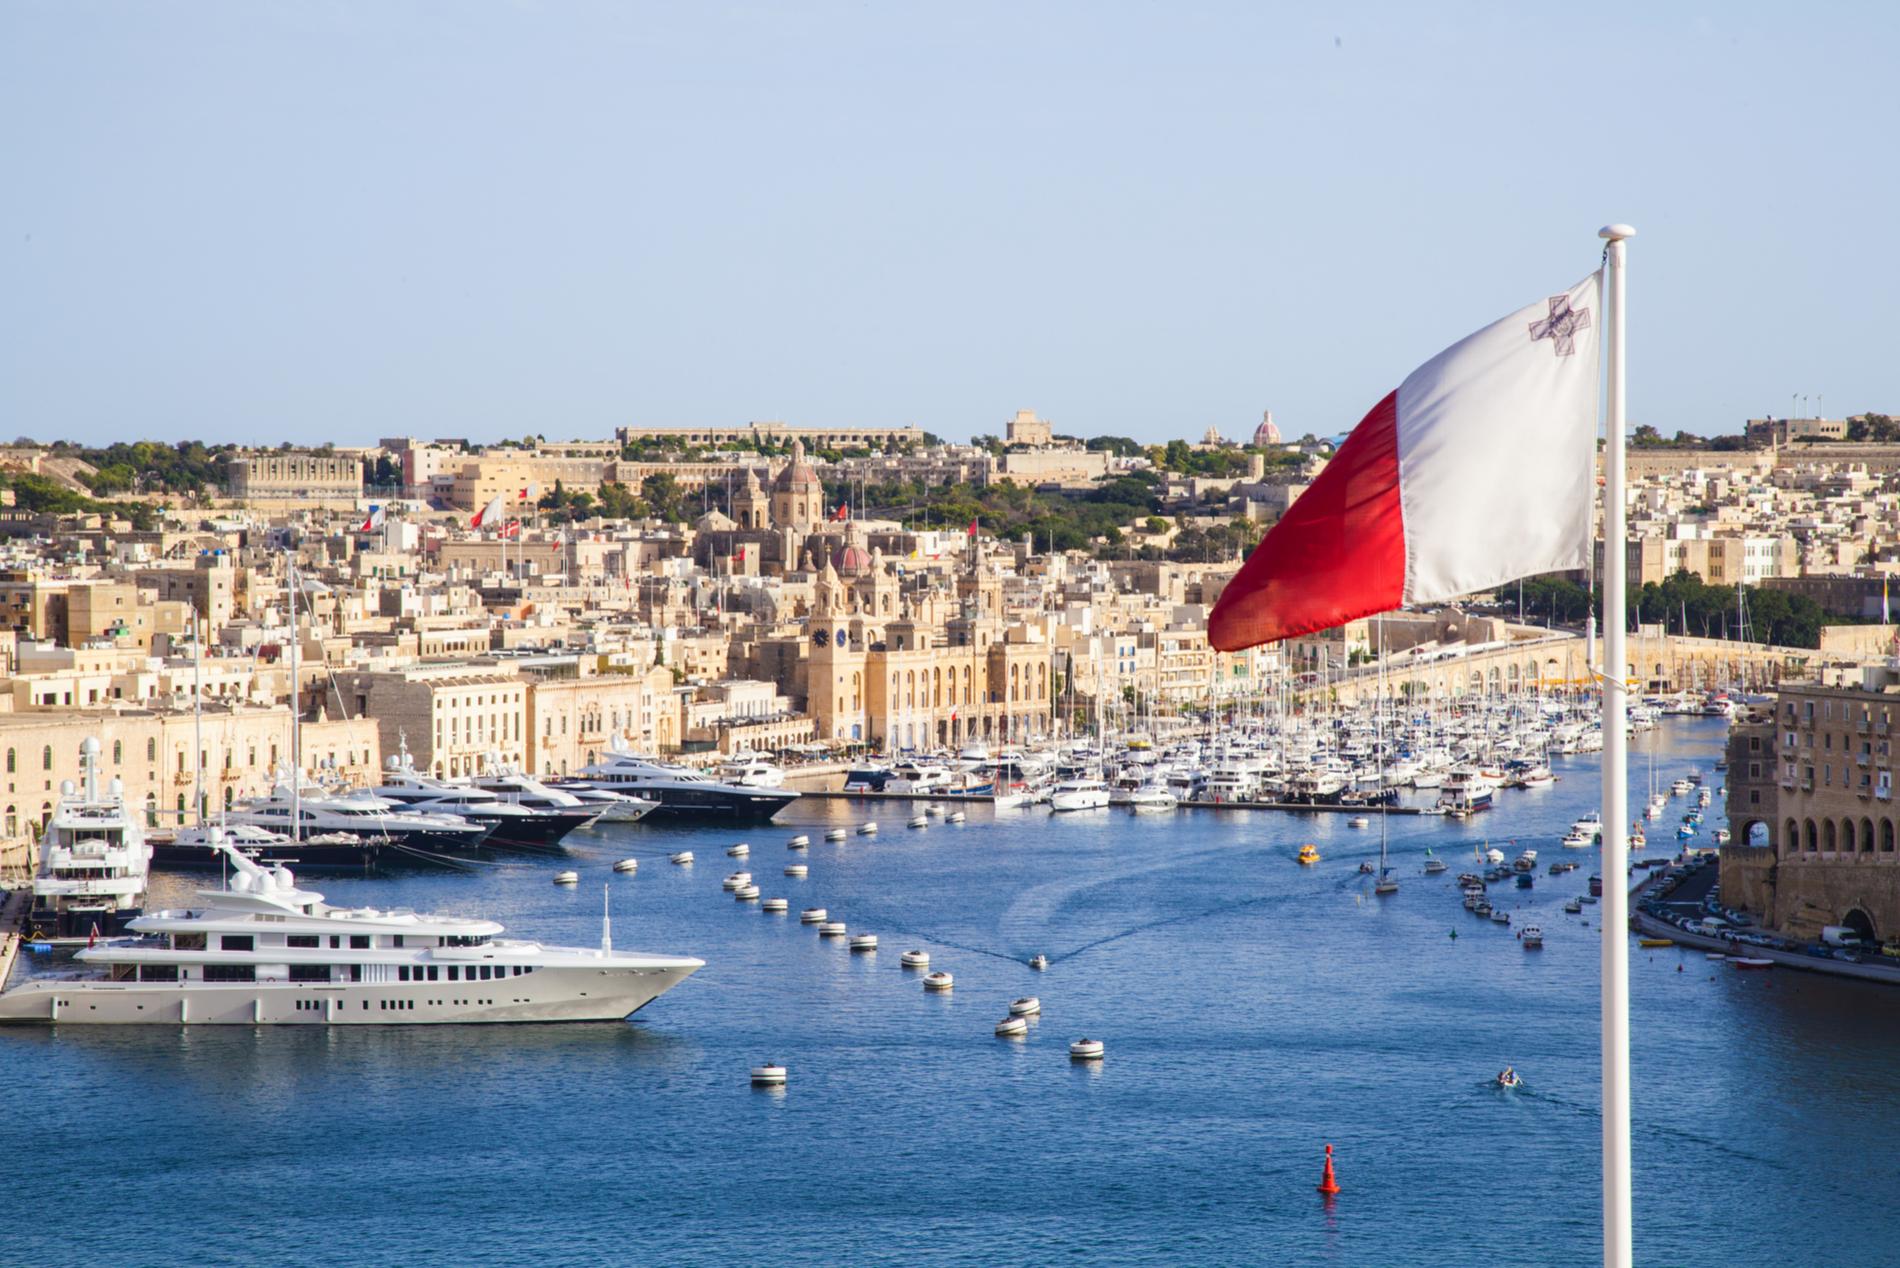 Bitcoin Price Discovery, Blockchain în Malta și e-Commerce în China: eToro Market Update